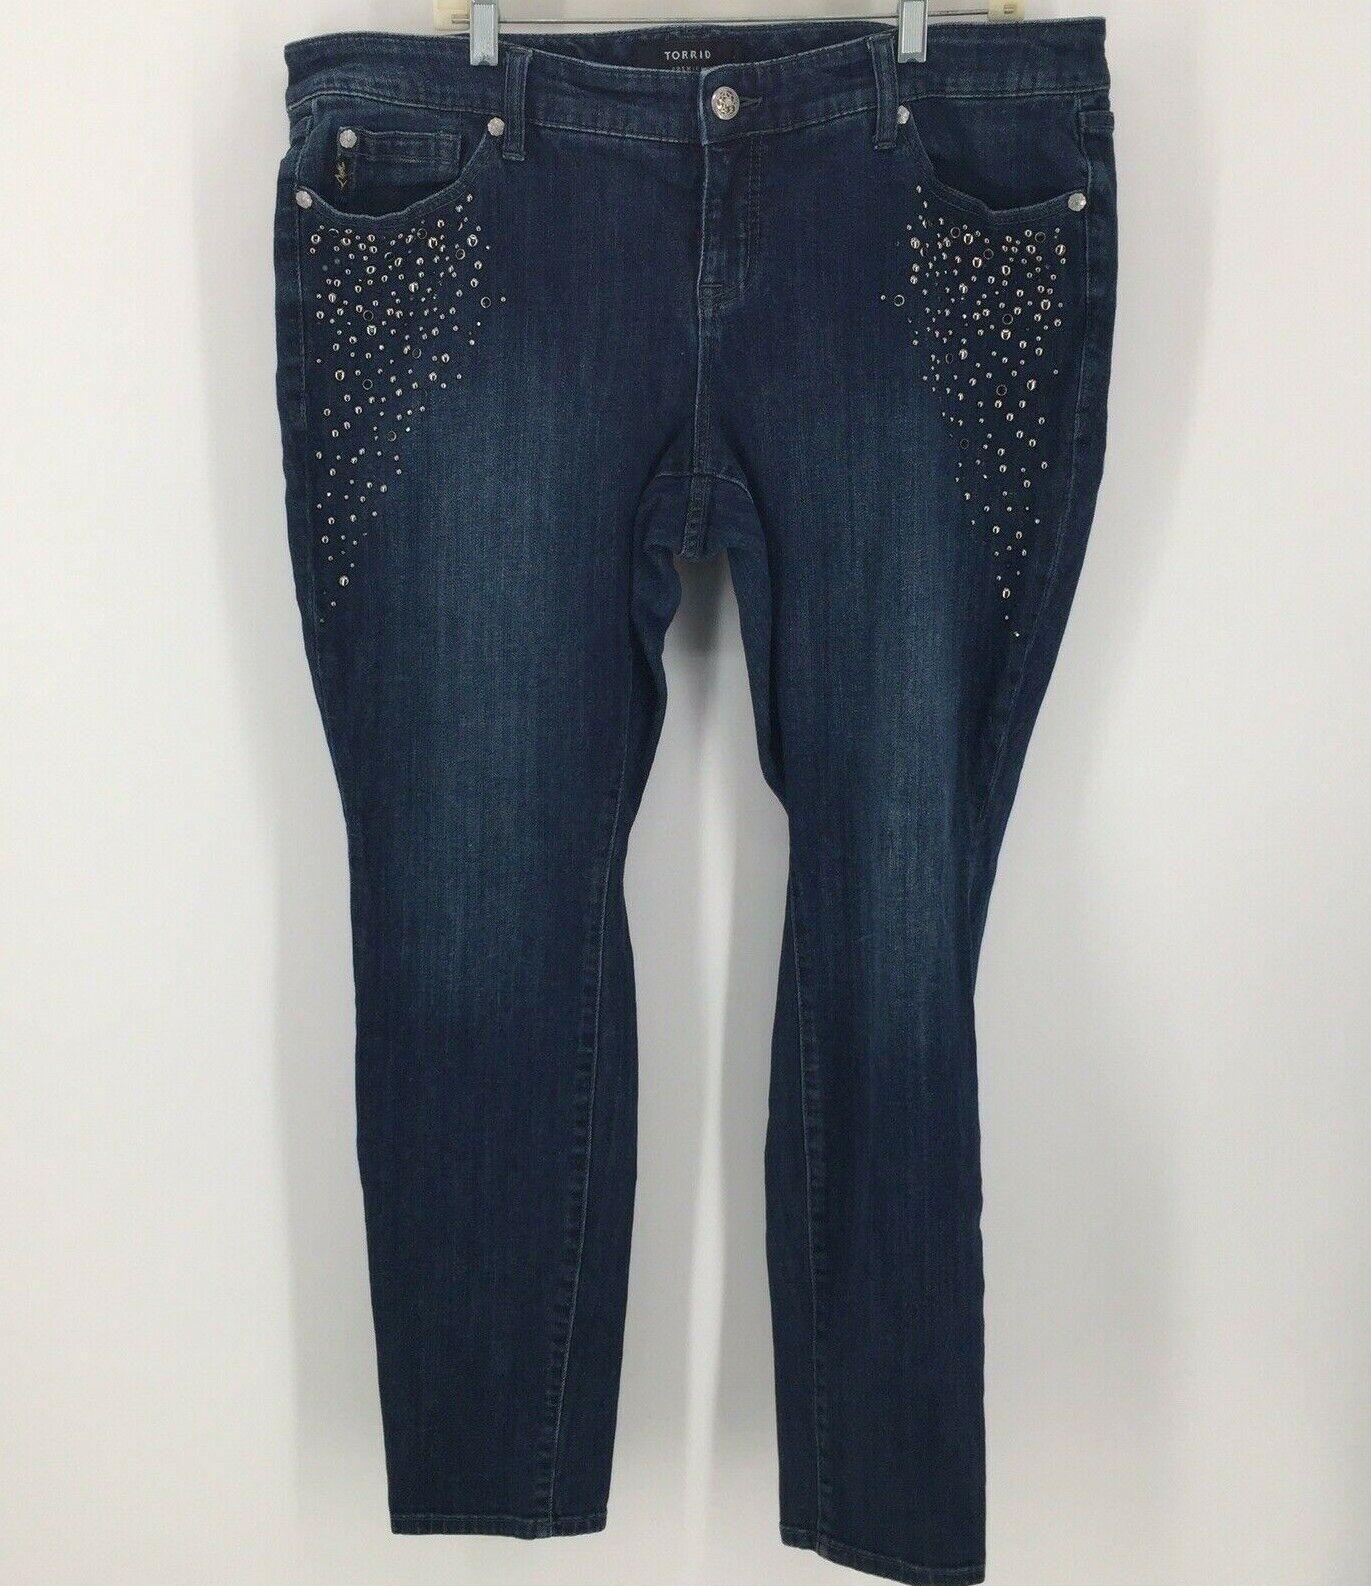 Torrid Premium Stretch Studded Skinny Jeans Size 16